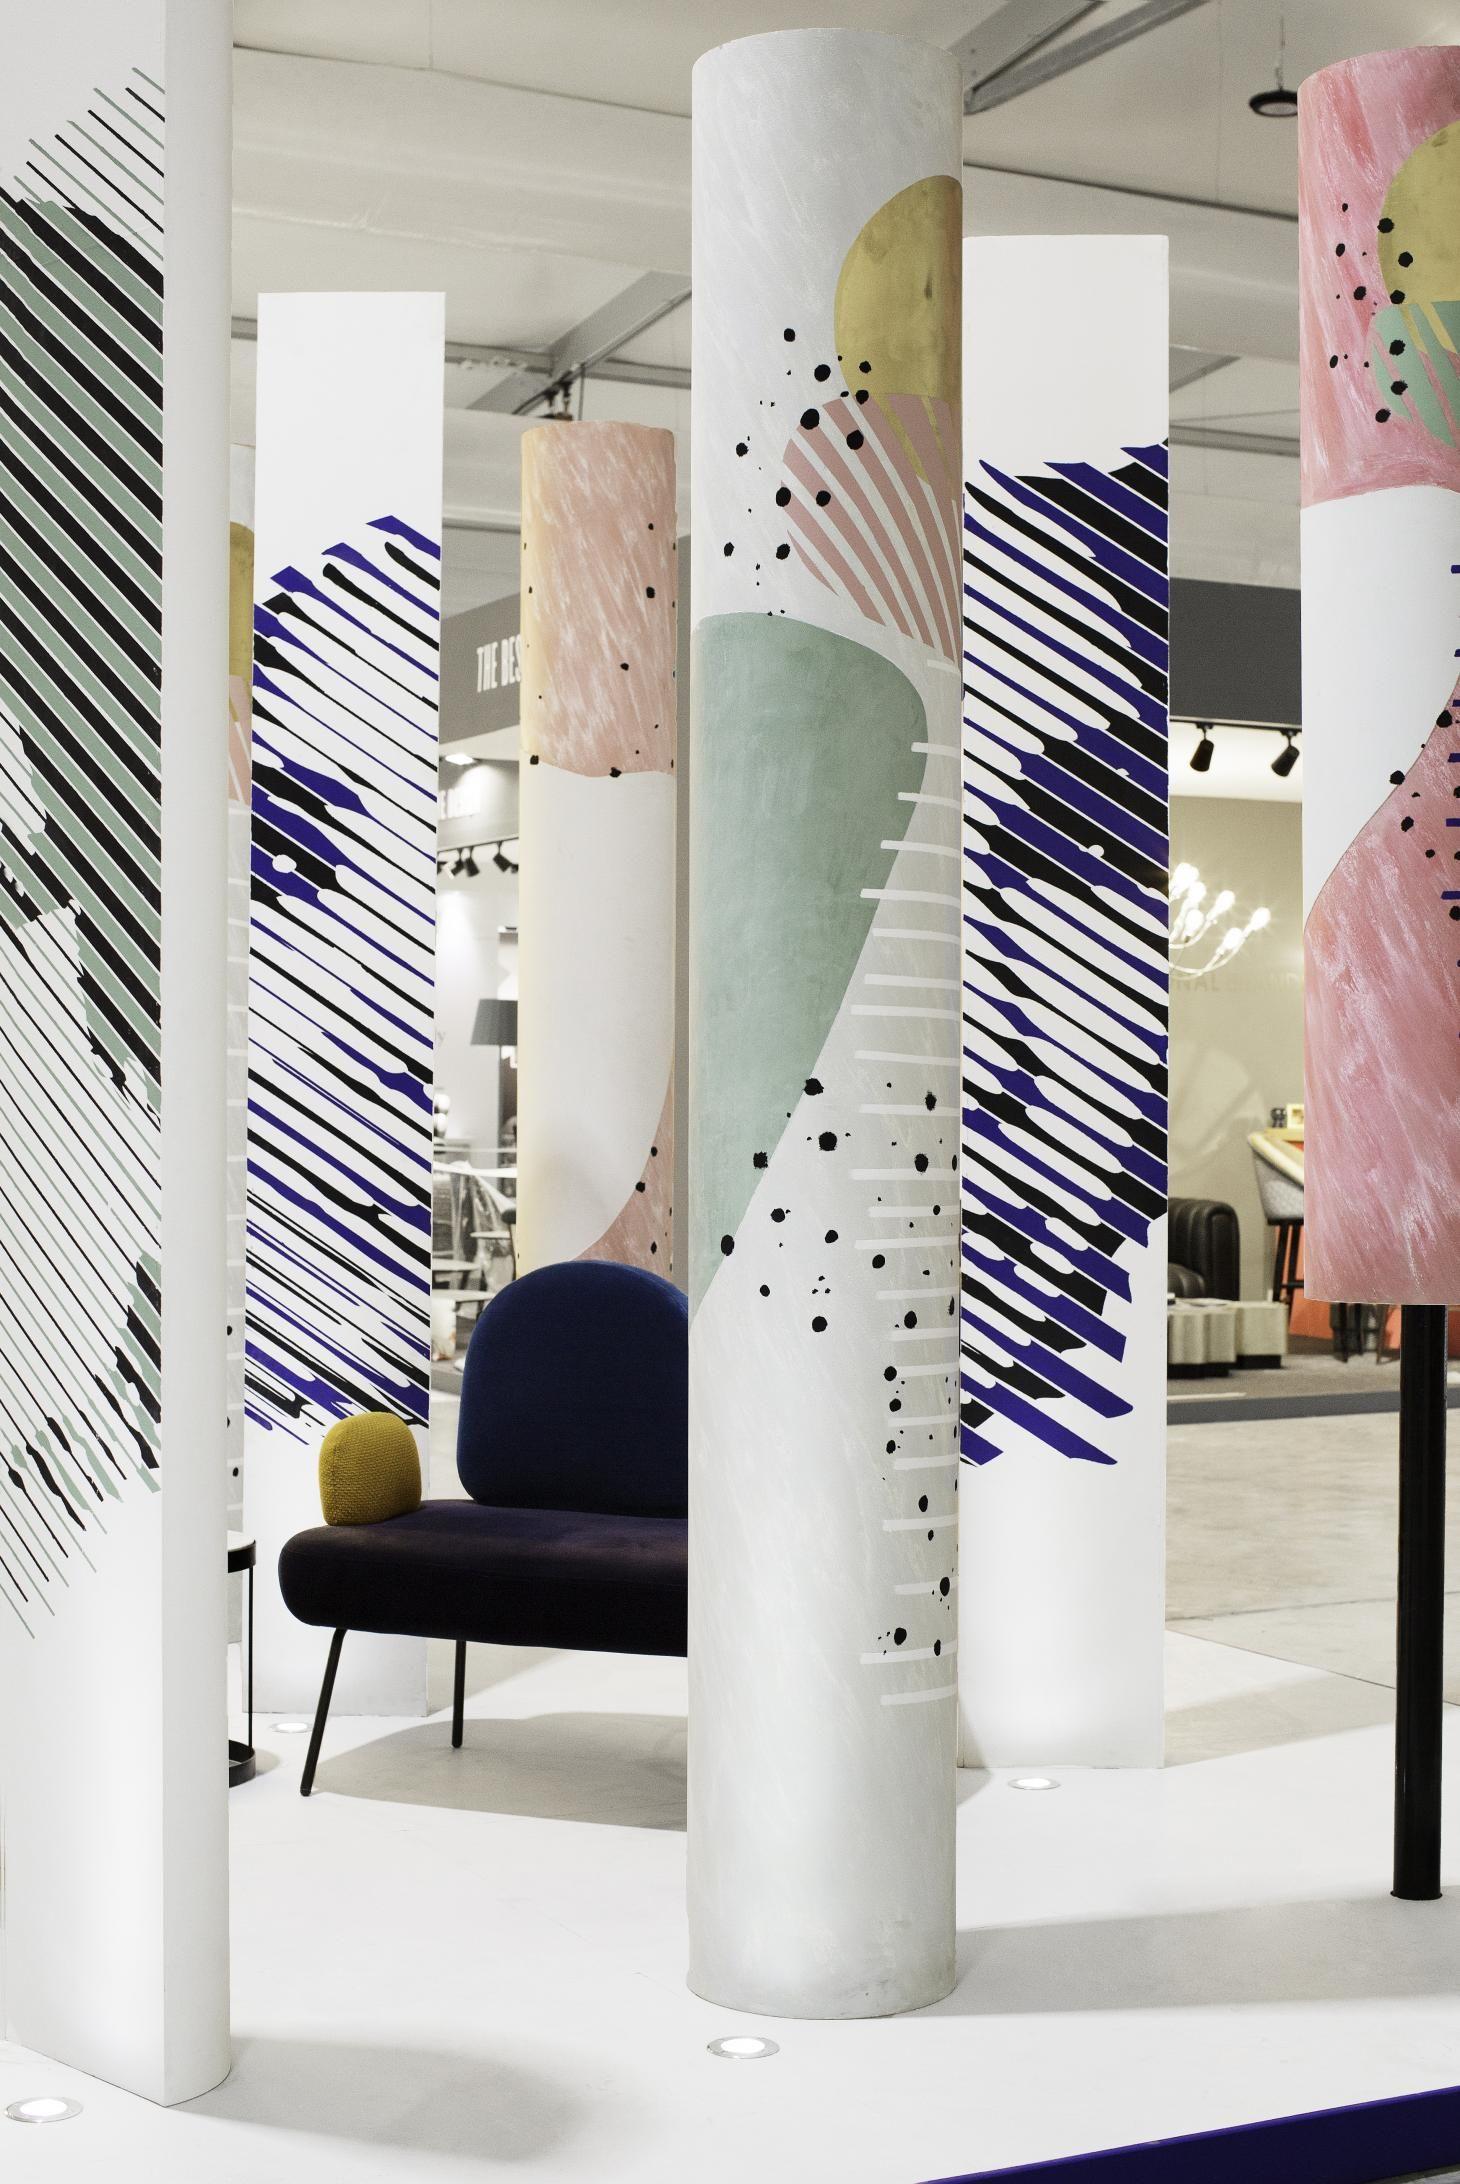 Uae S Thriving Creative Scene Catapults Dubai Design Week Onto A Global Stage Column Design Interior Columns Dubai Design Week